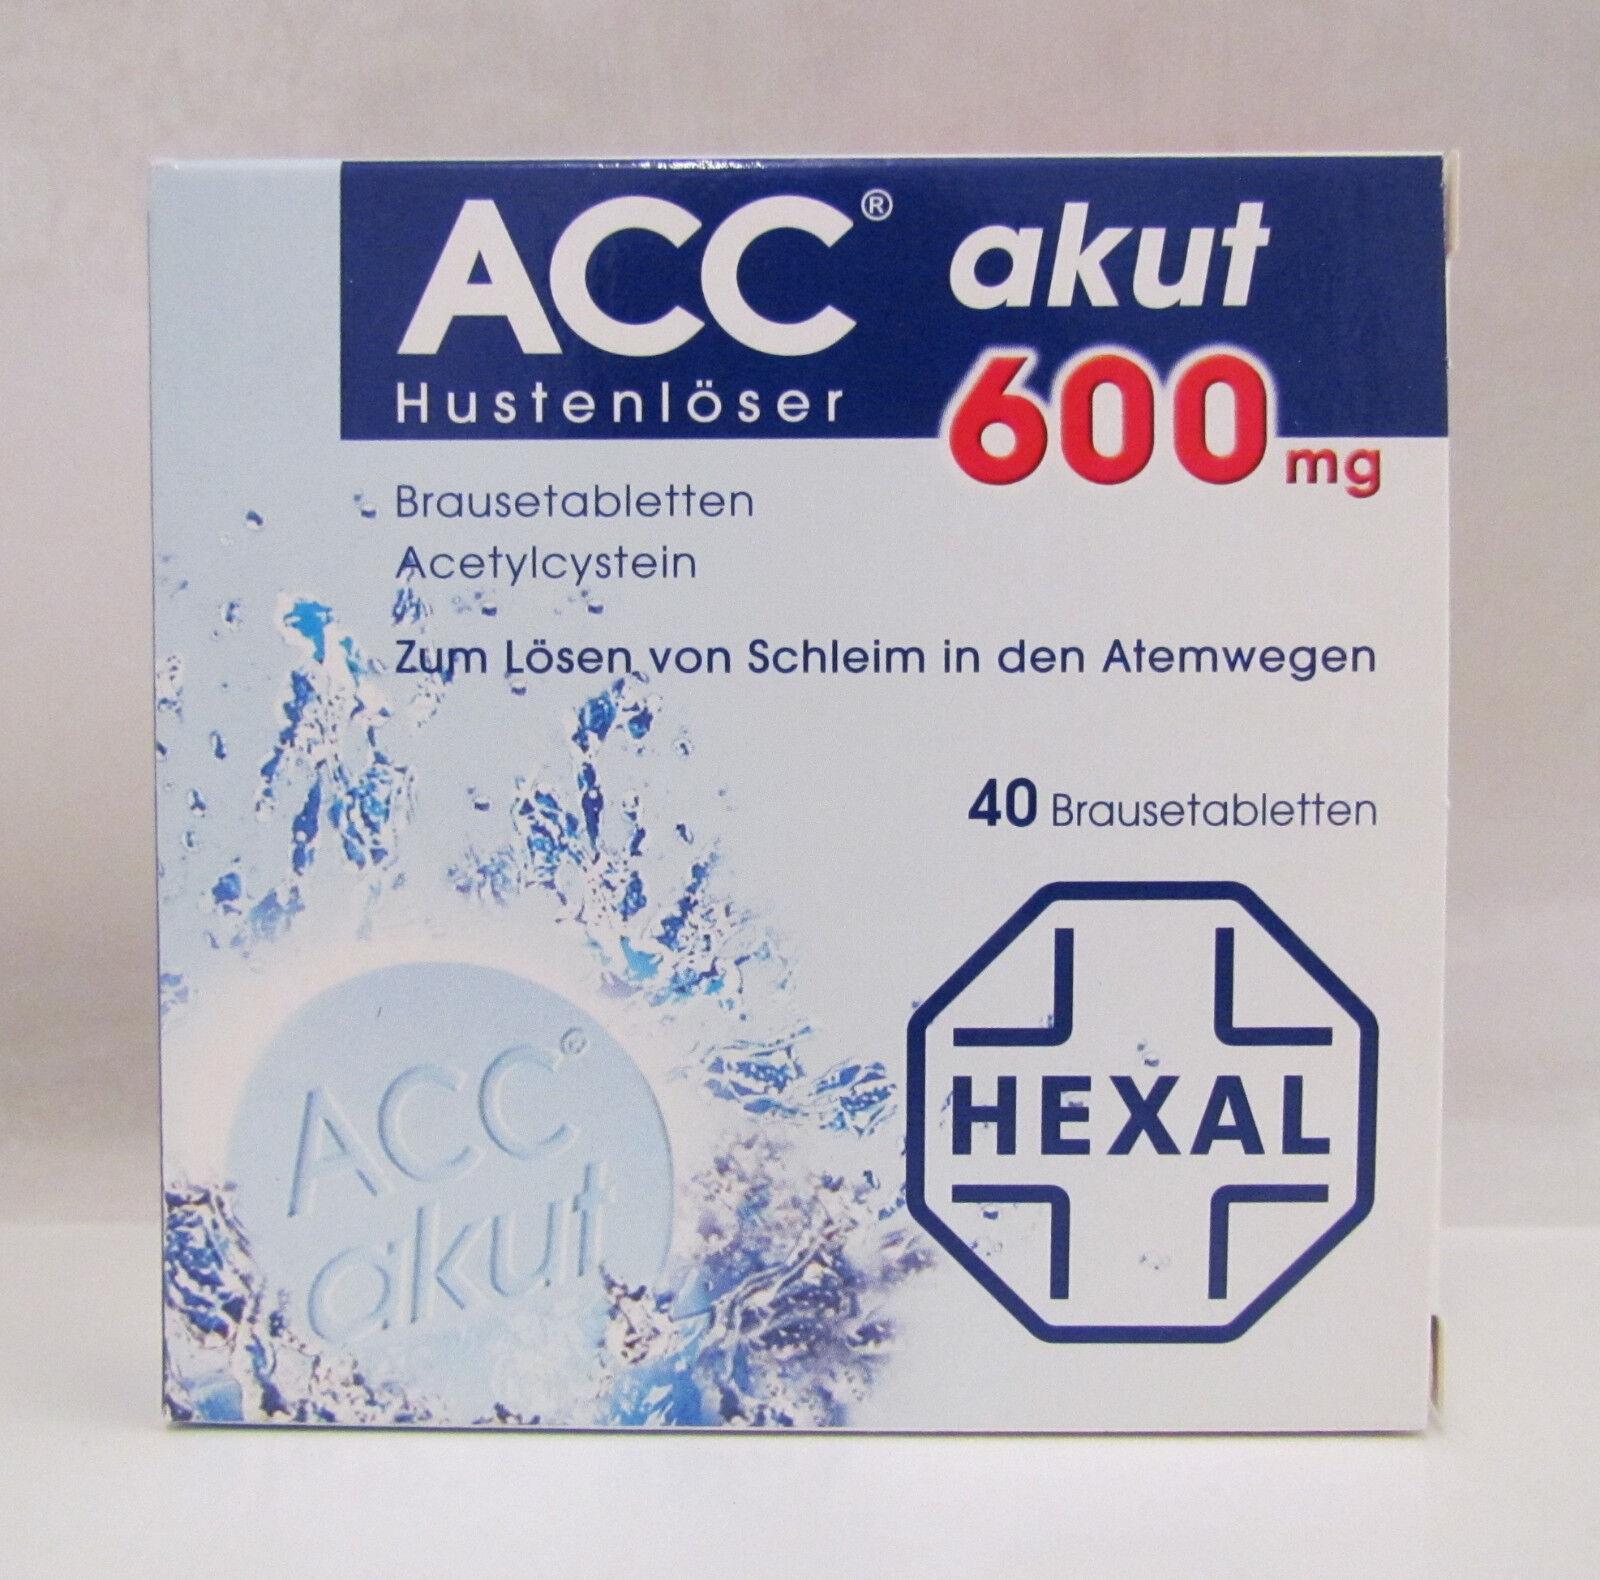 ACC akut 600 Hustenlöser 40 Brausetabletten  Hexal PZN: 00520917